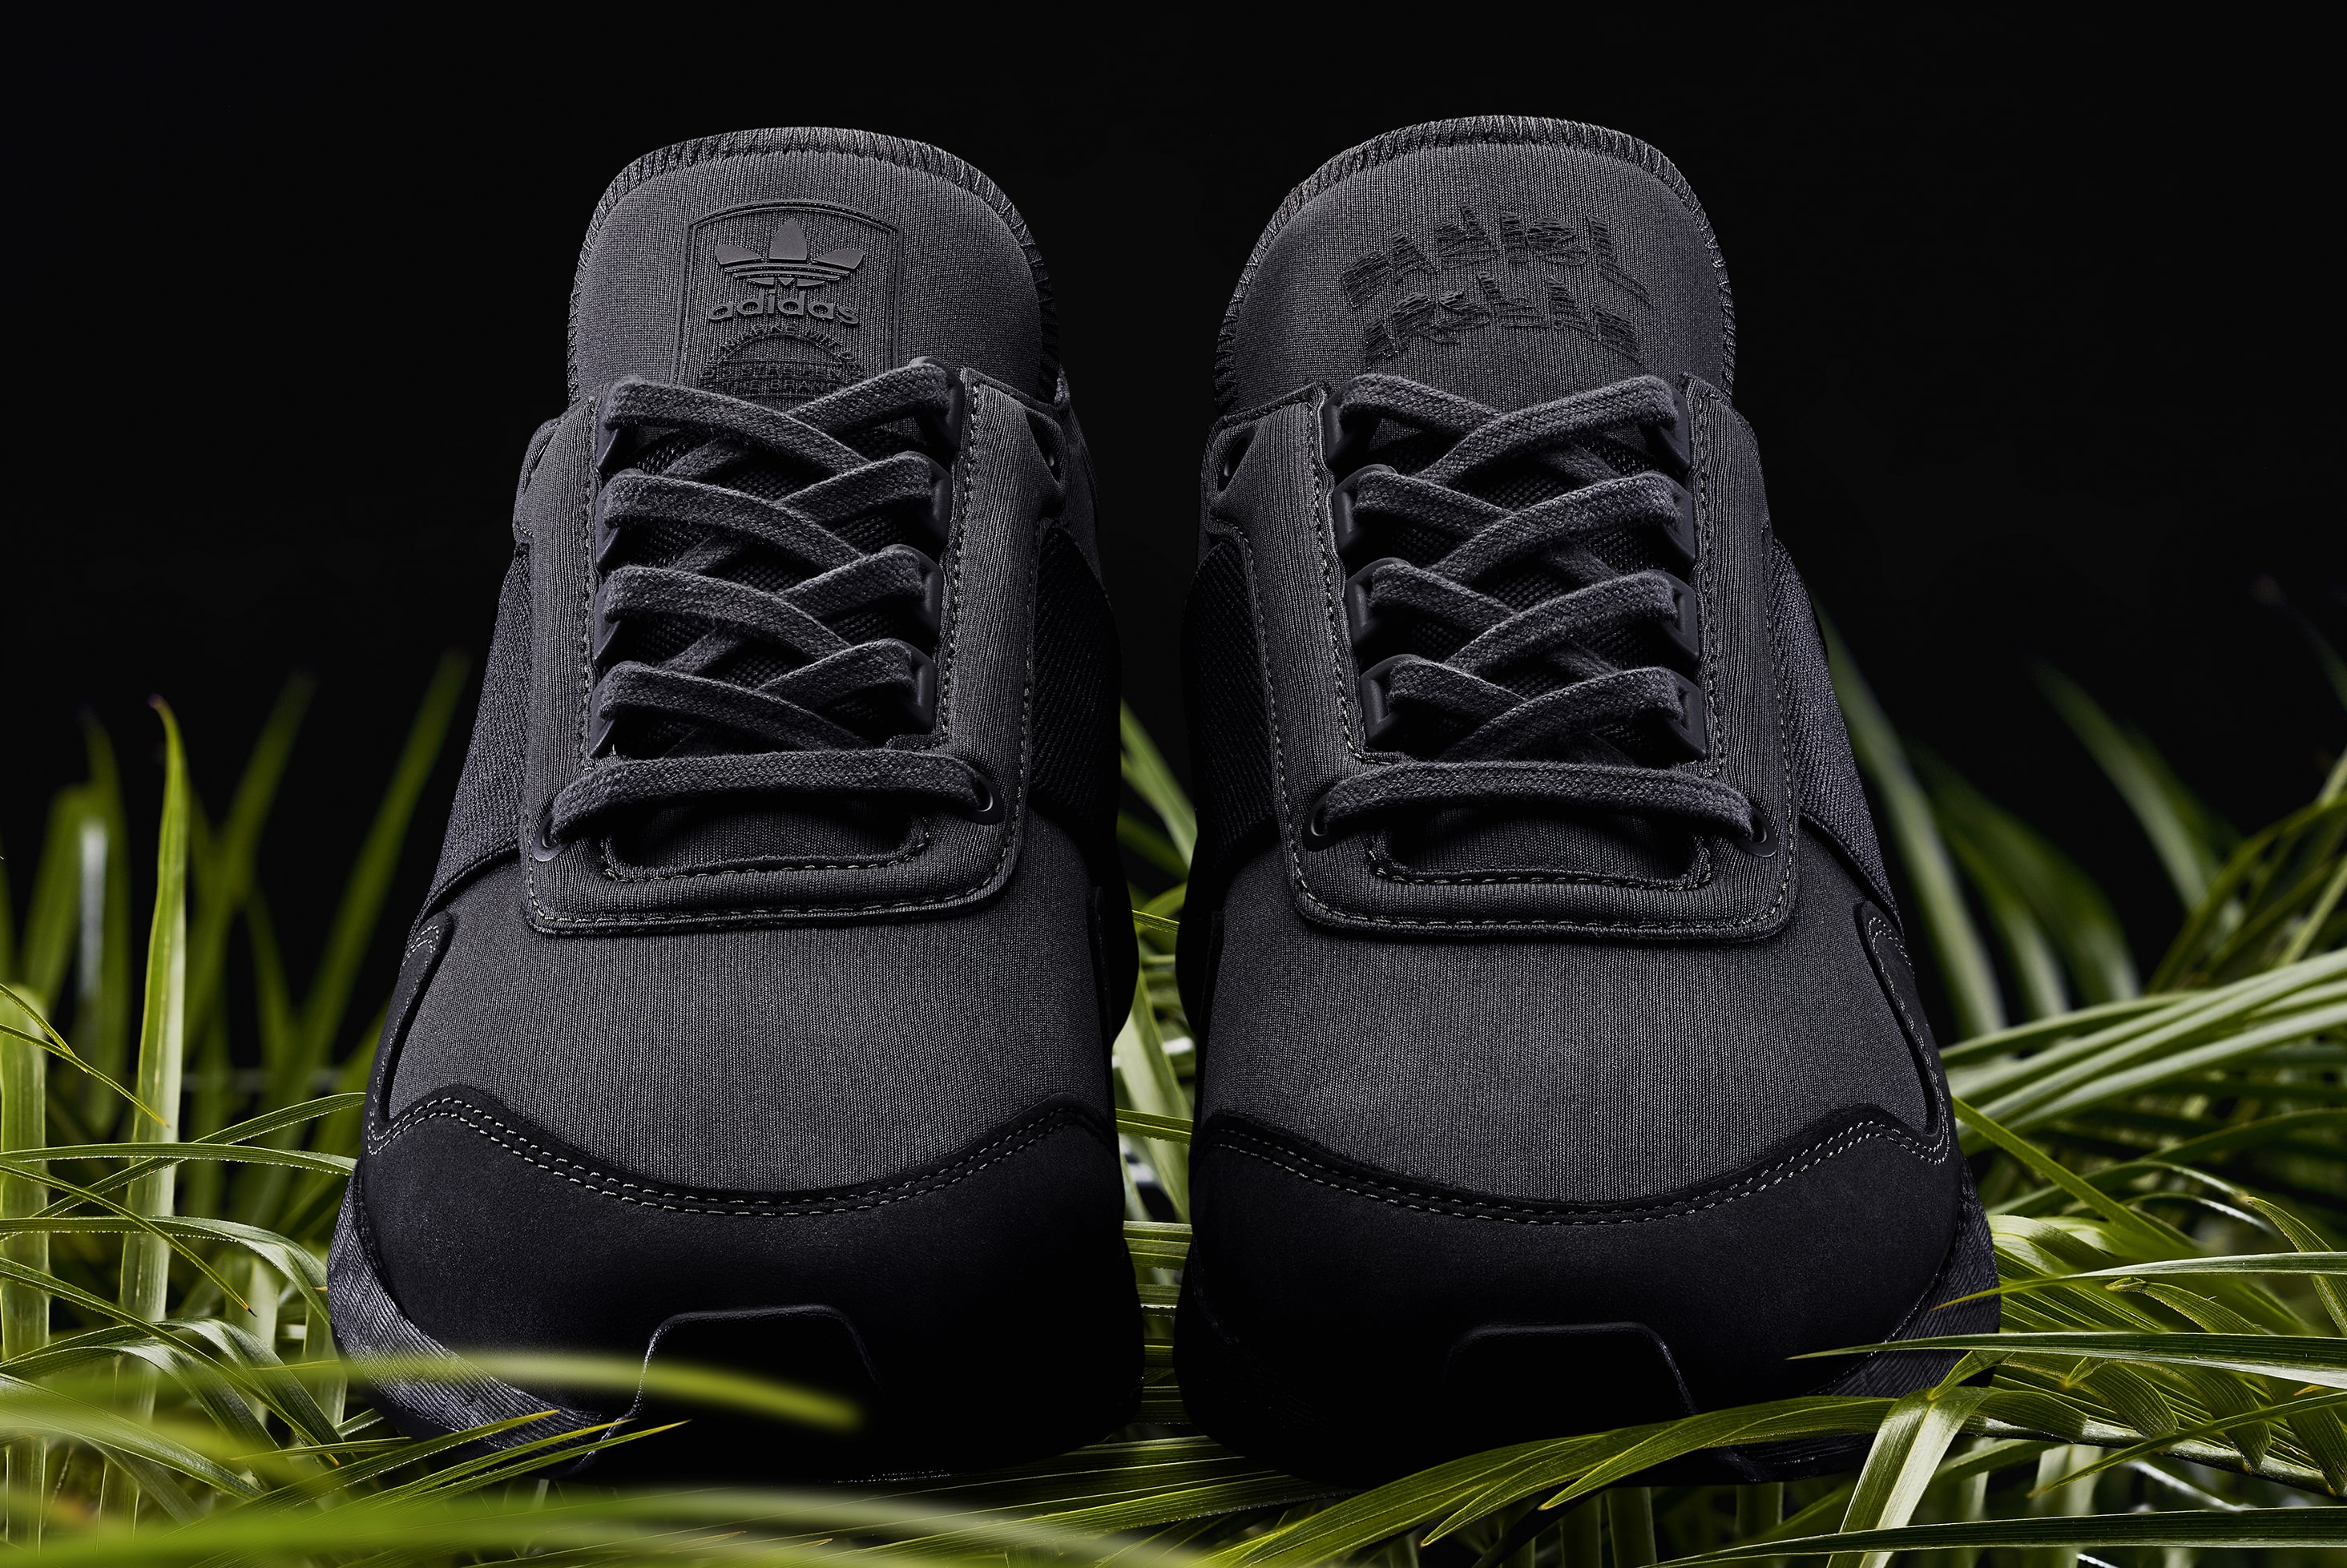 Daniel Arsham x Adidas New York Present DB1971 (Front)